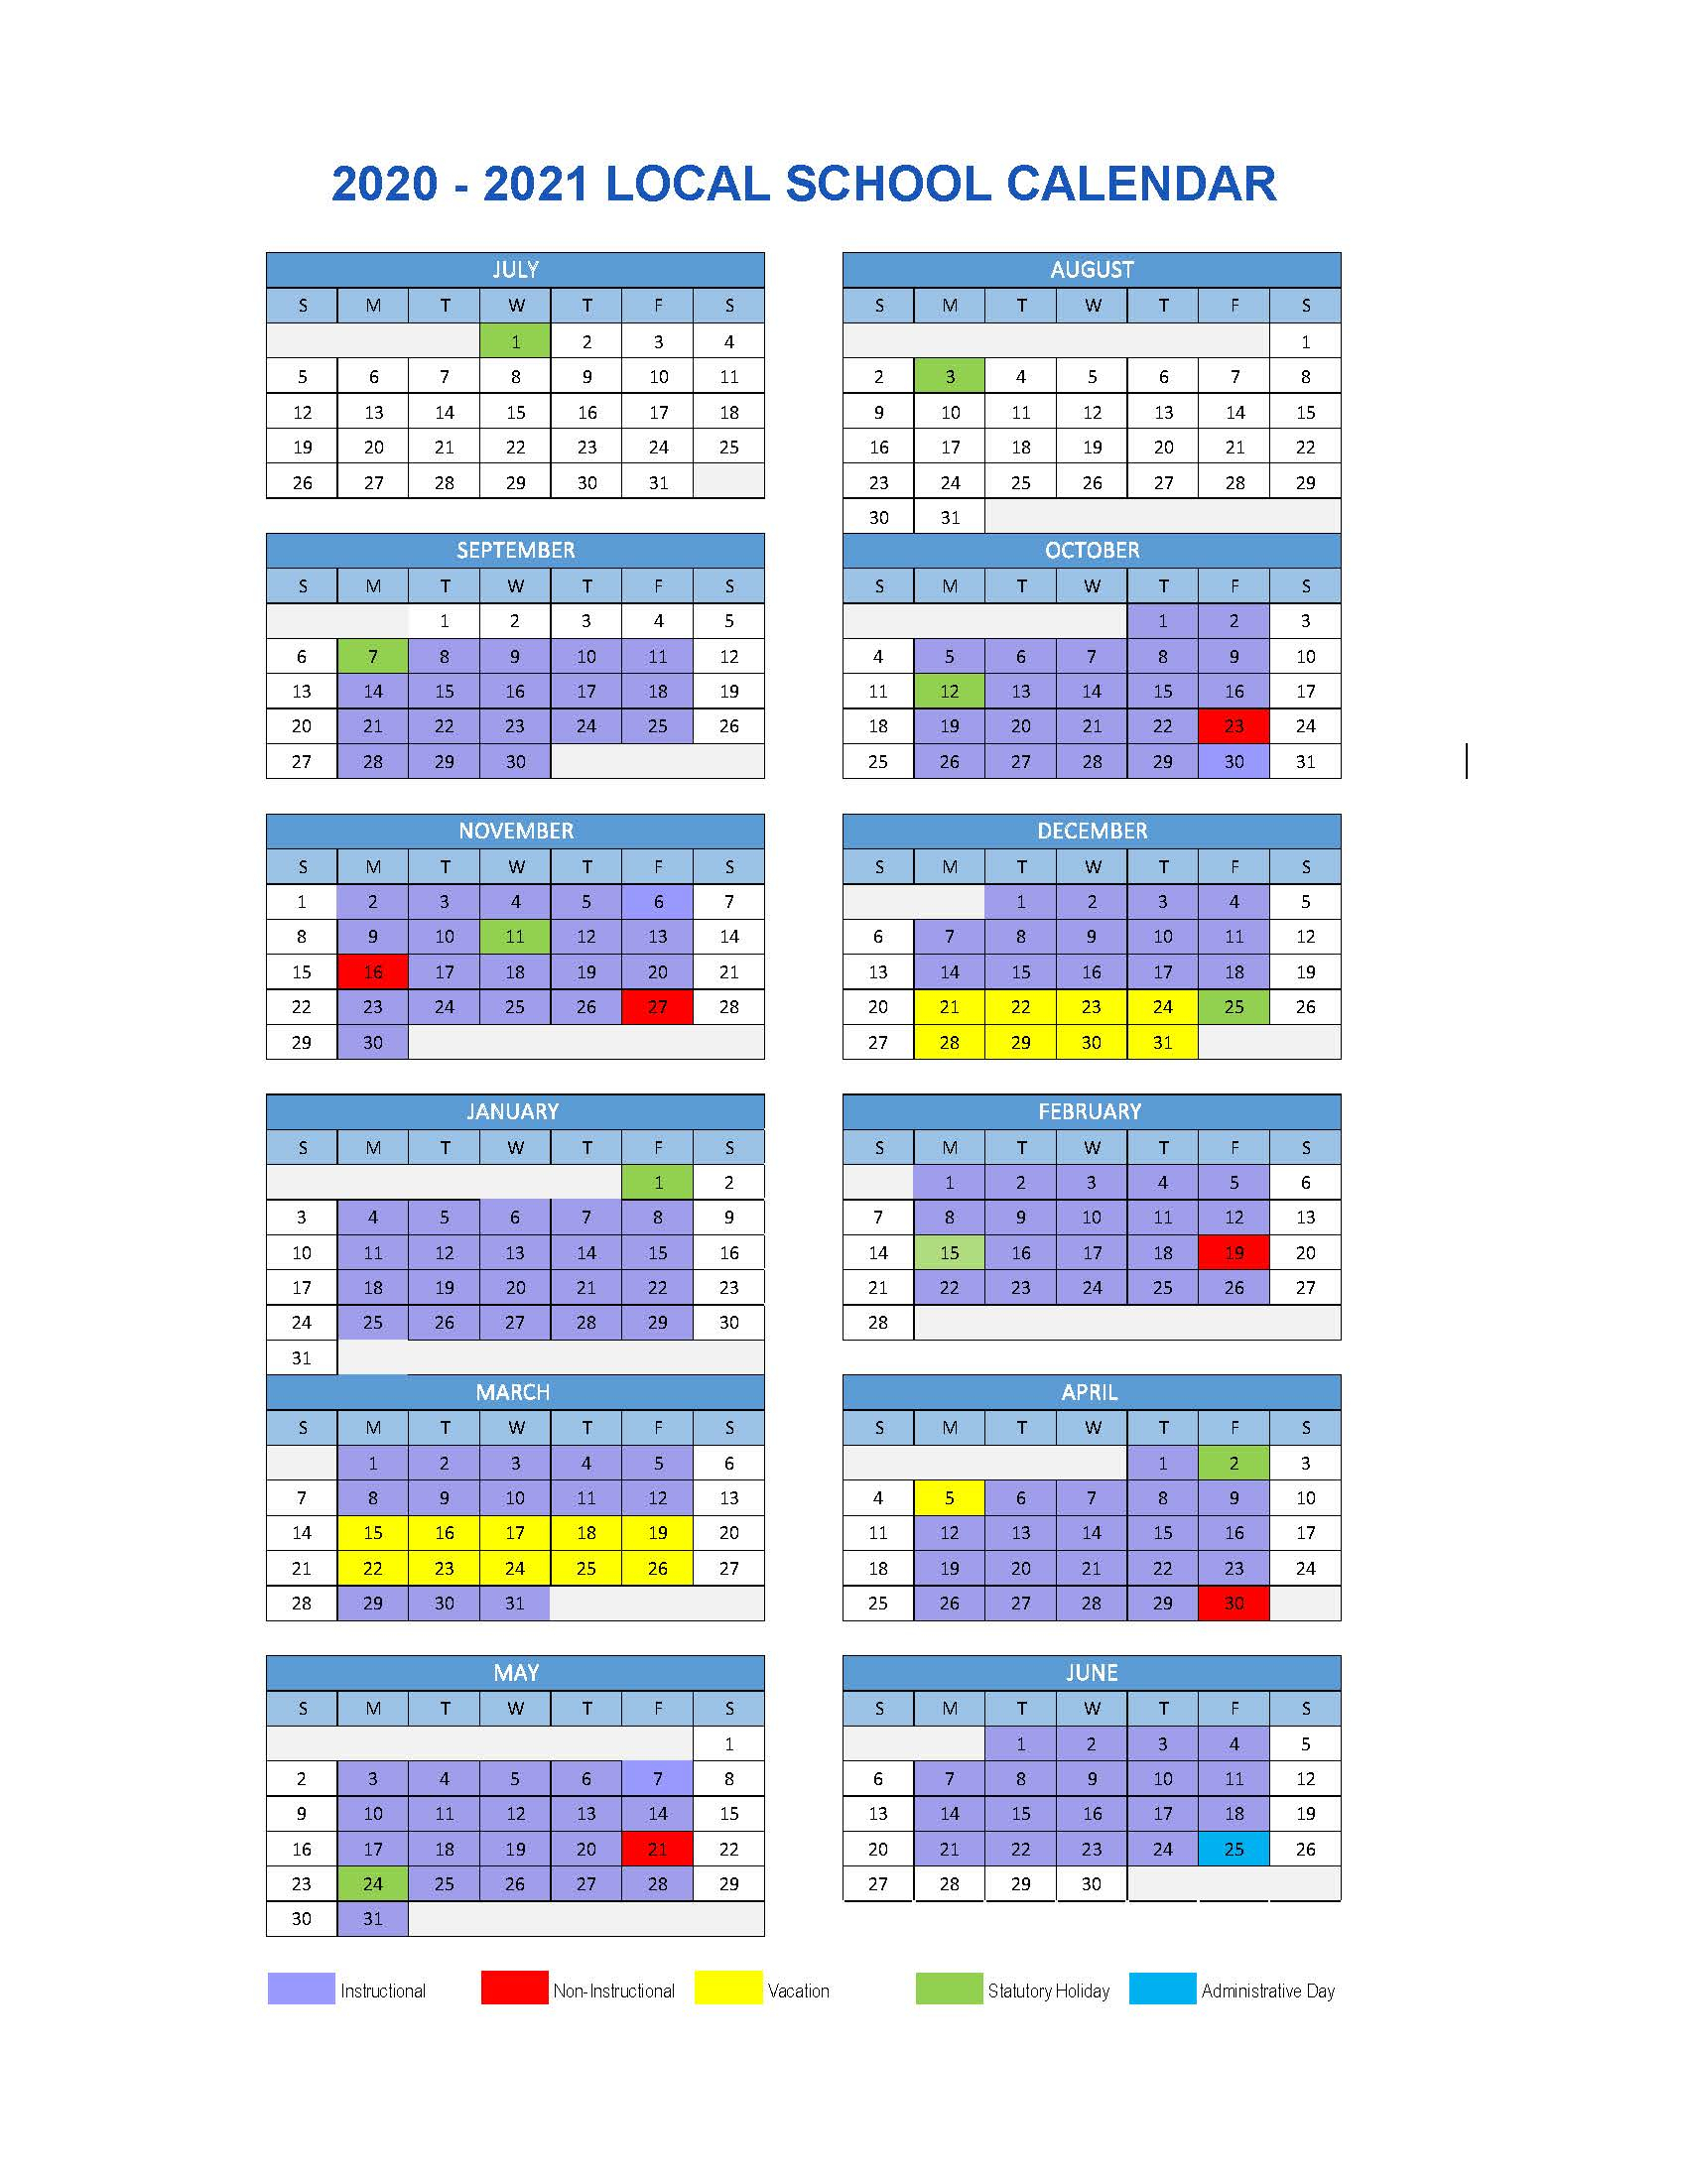 Local School Calendar 2020/2021